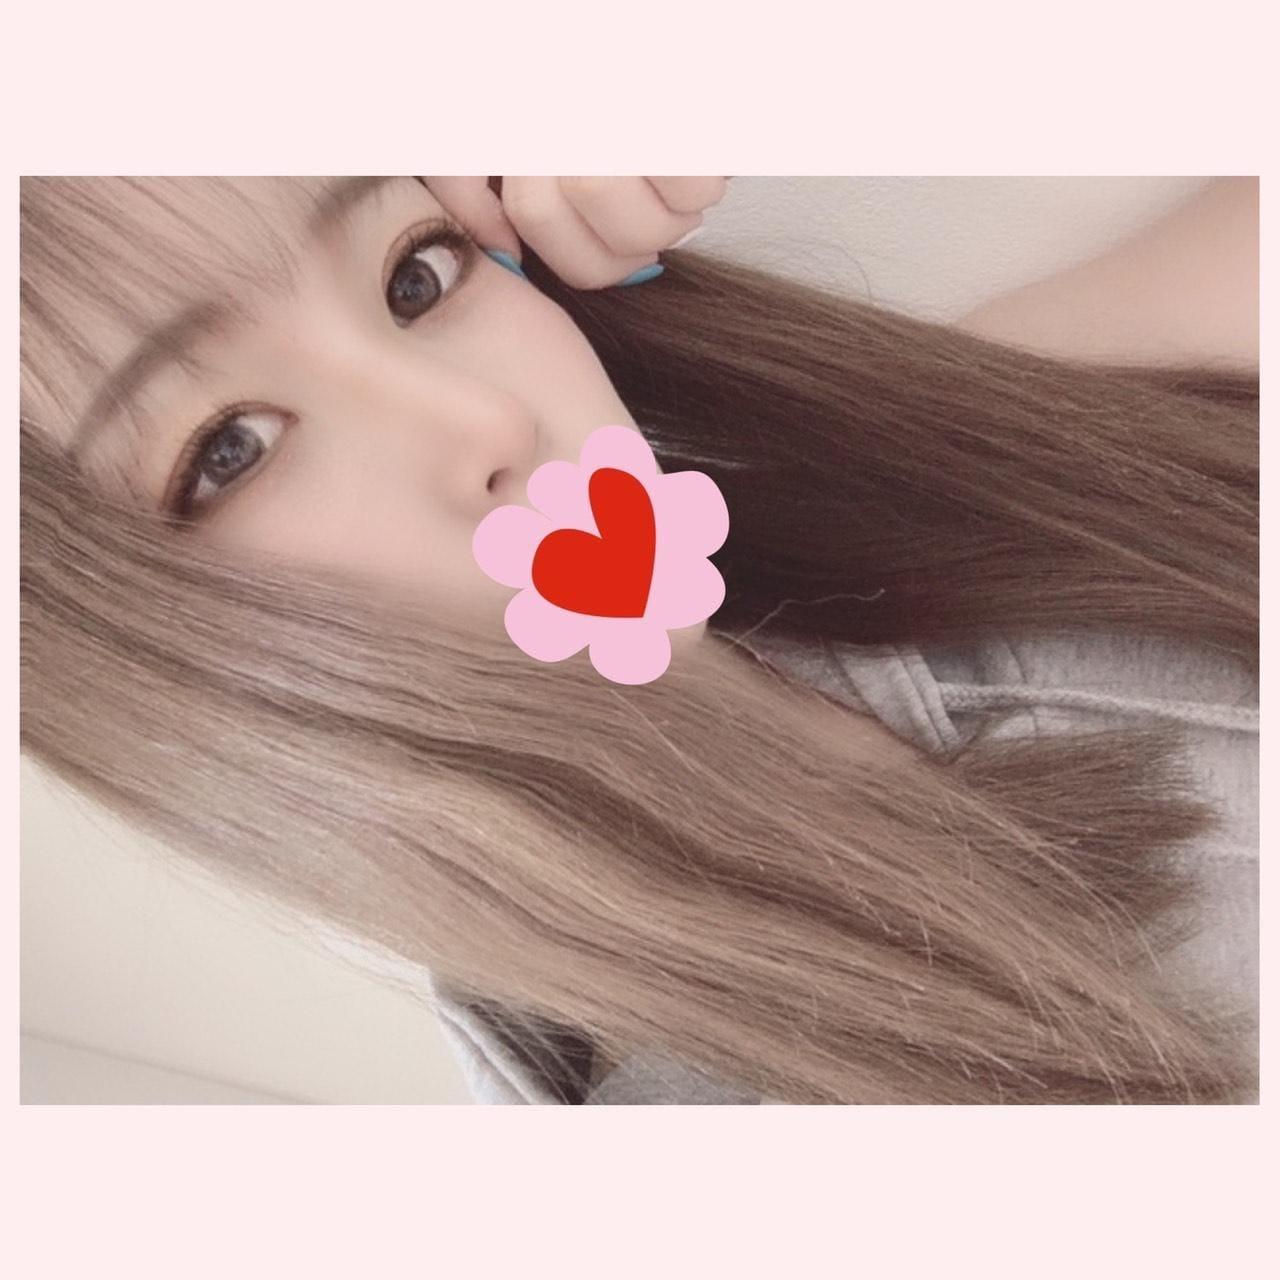 「K君☆」02/22(02/22) 22:10 | Eclair-エクレア-の写メ・風俗動画